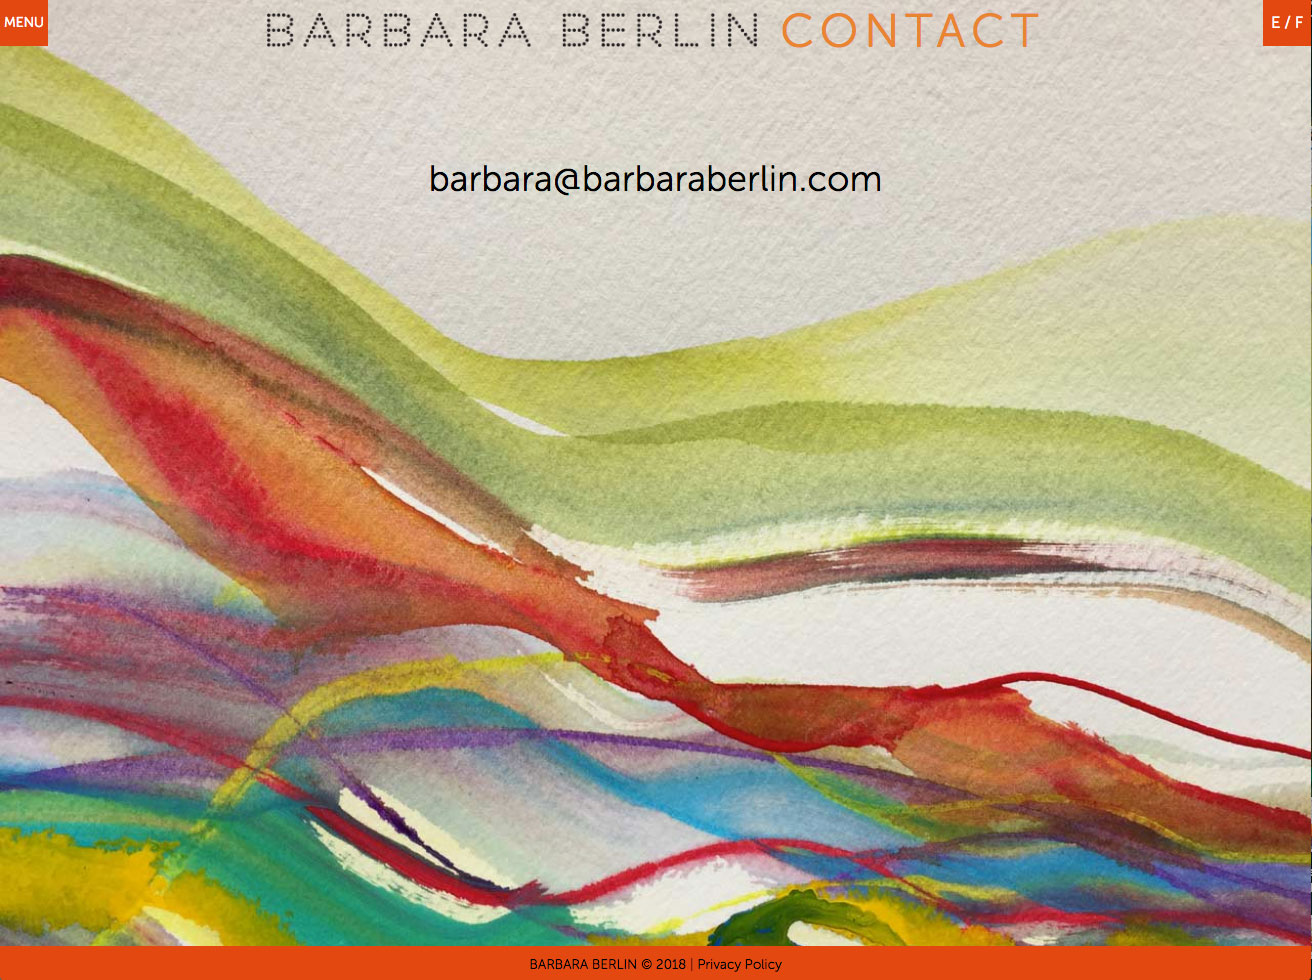 5-BBerlin-Contact